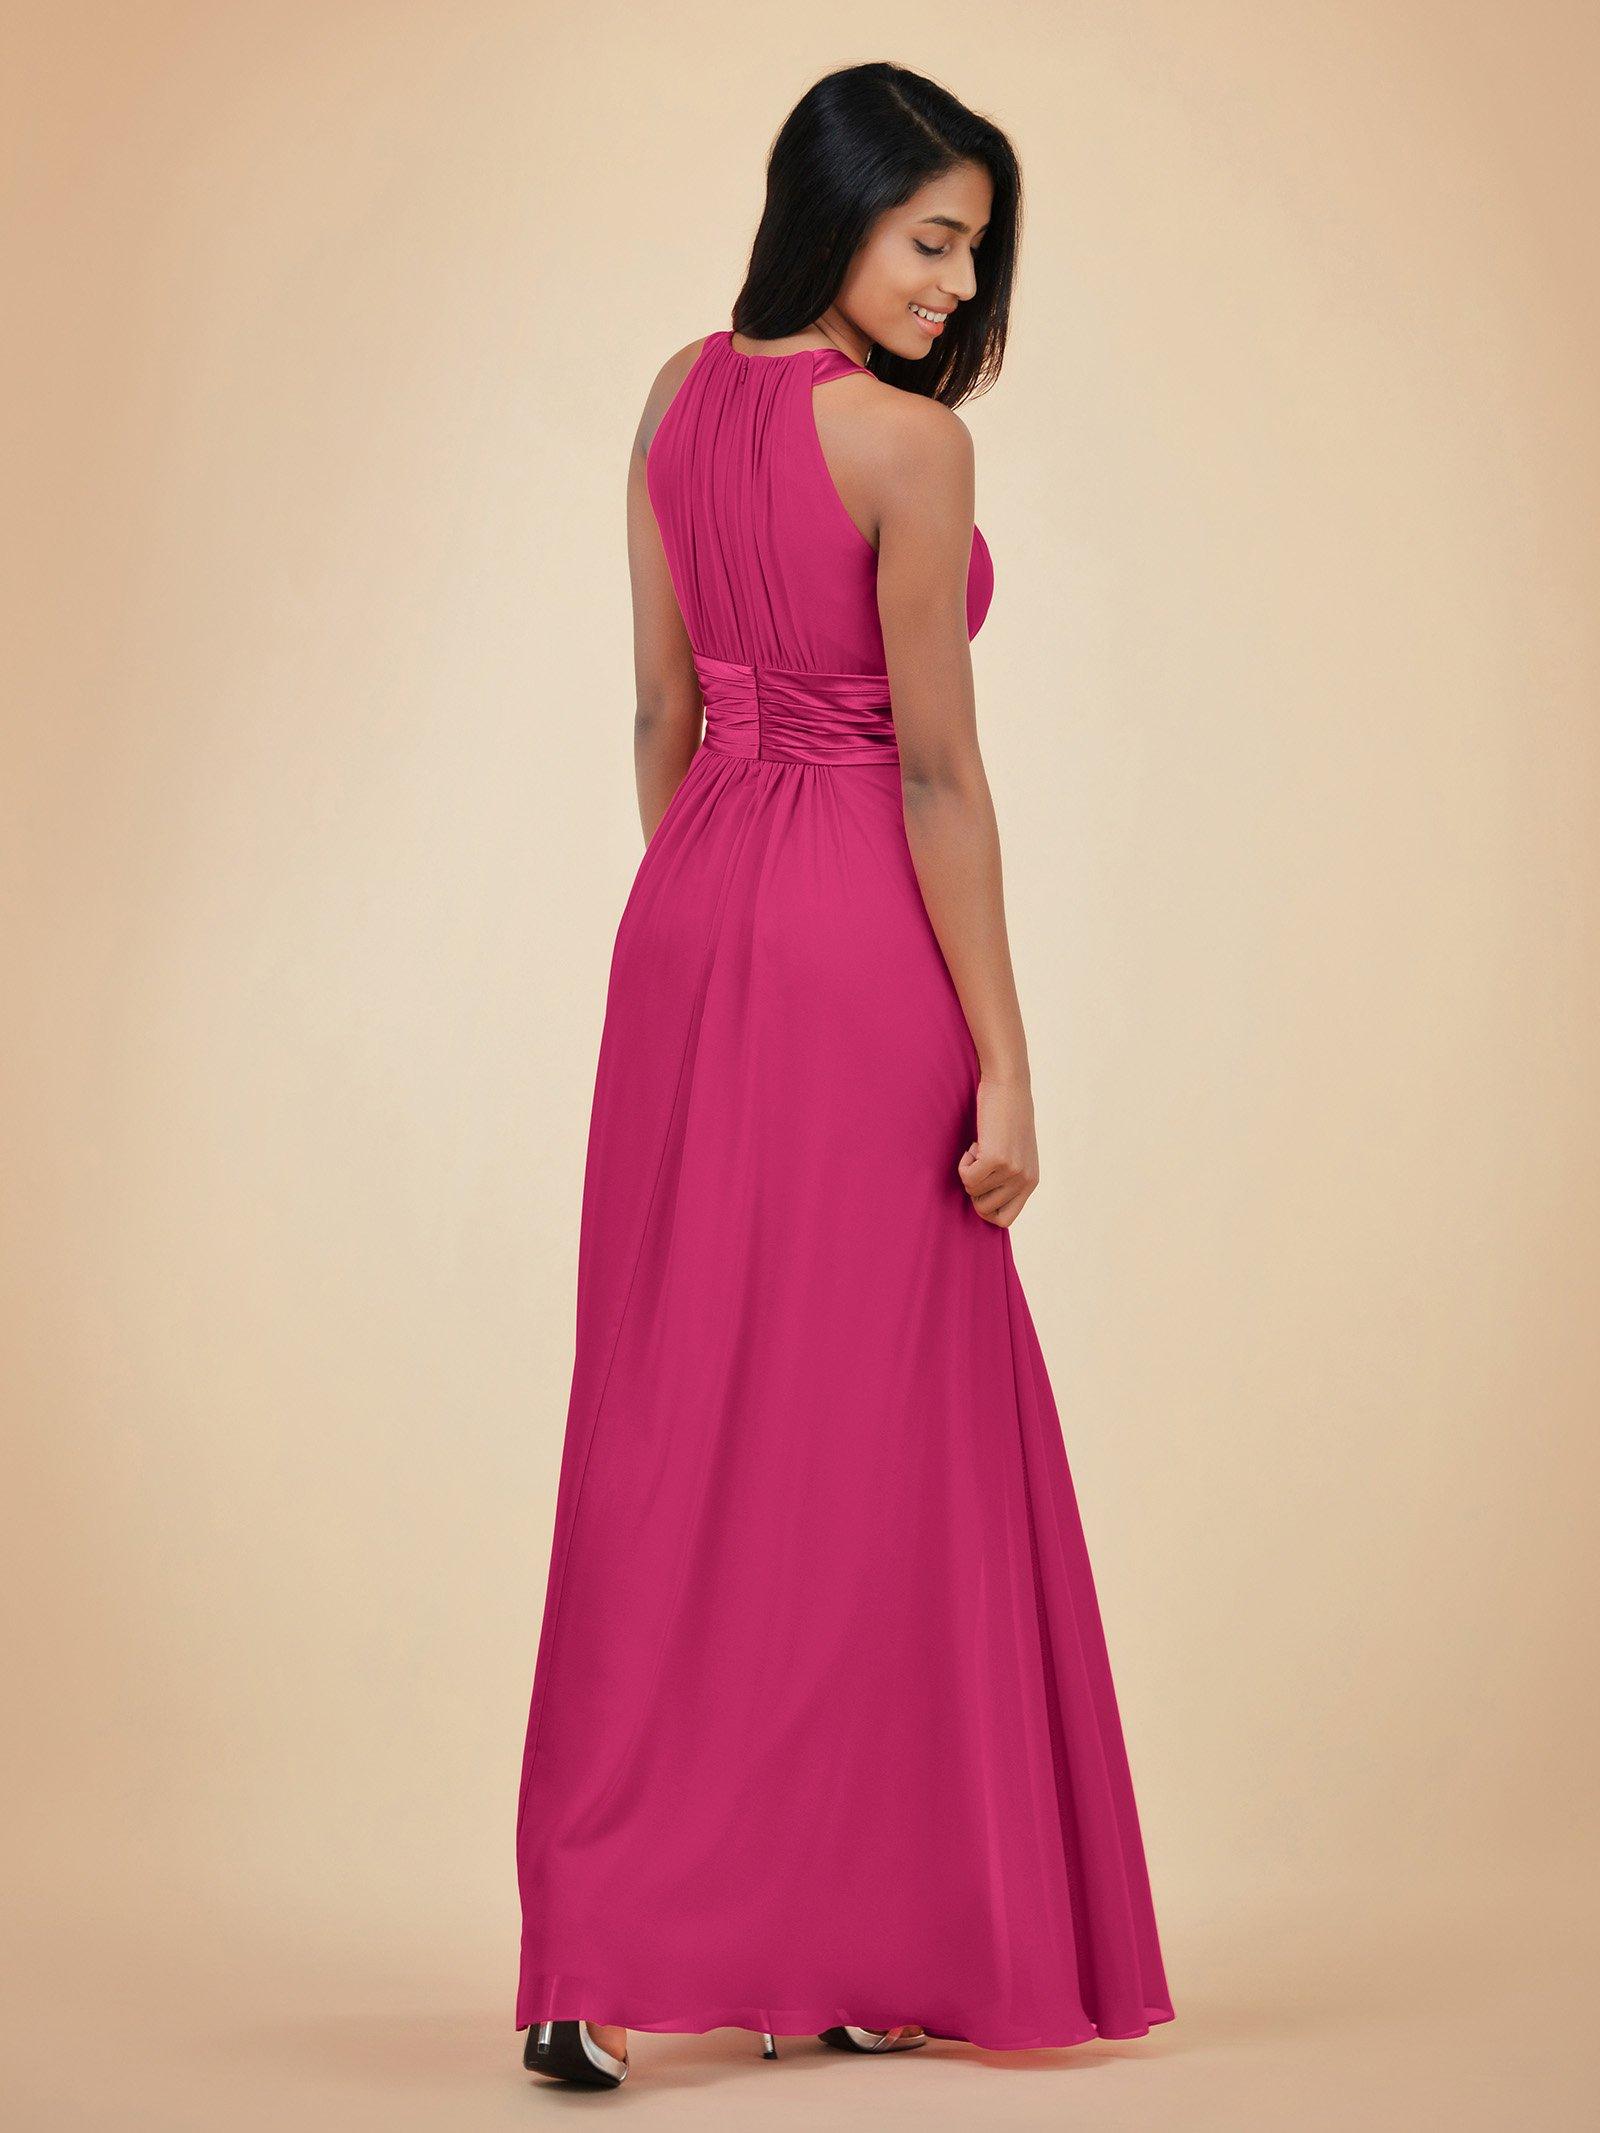 a27fdae07de ... Bridesmaid Dresses Long for Women Formal Elegant Halter Evening Dresses  for Weddings Empire Maxi Party Prom Gown